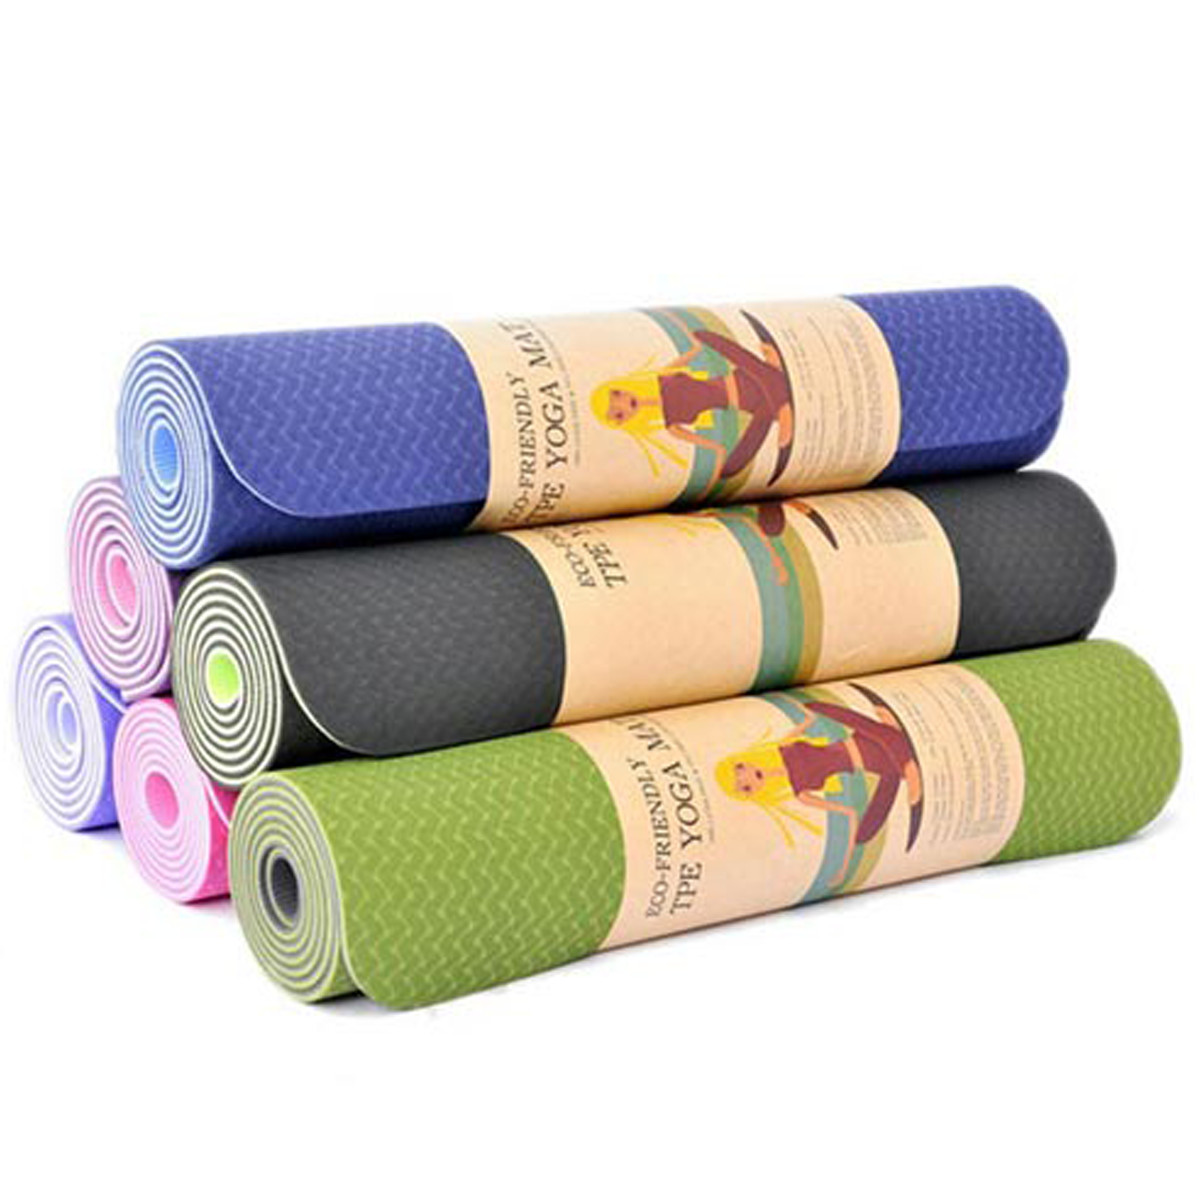 Thảm Tập YoGa miDoctor + Bao Thảm Tập Yoga + Dây Thảm Tập Yoga - 16053799 , 5834559247761 , 62_21947278 , 350000 , Tham-Tap-YoGa-miDoctor-Bao-Tham-Tap-Yoga-Day-Tham-Tap-Yoga-62_21947278 , tiki.vn , Thảm Tập YoGa miDoctor + Bao Thảm Tập Yoga + Dây Thảm Tập Yoga